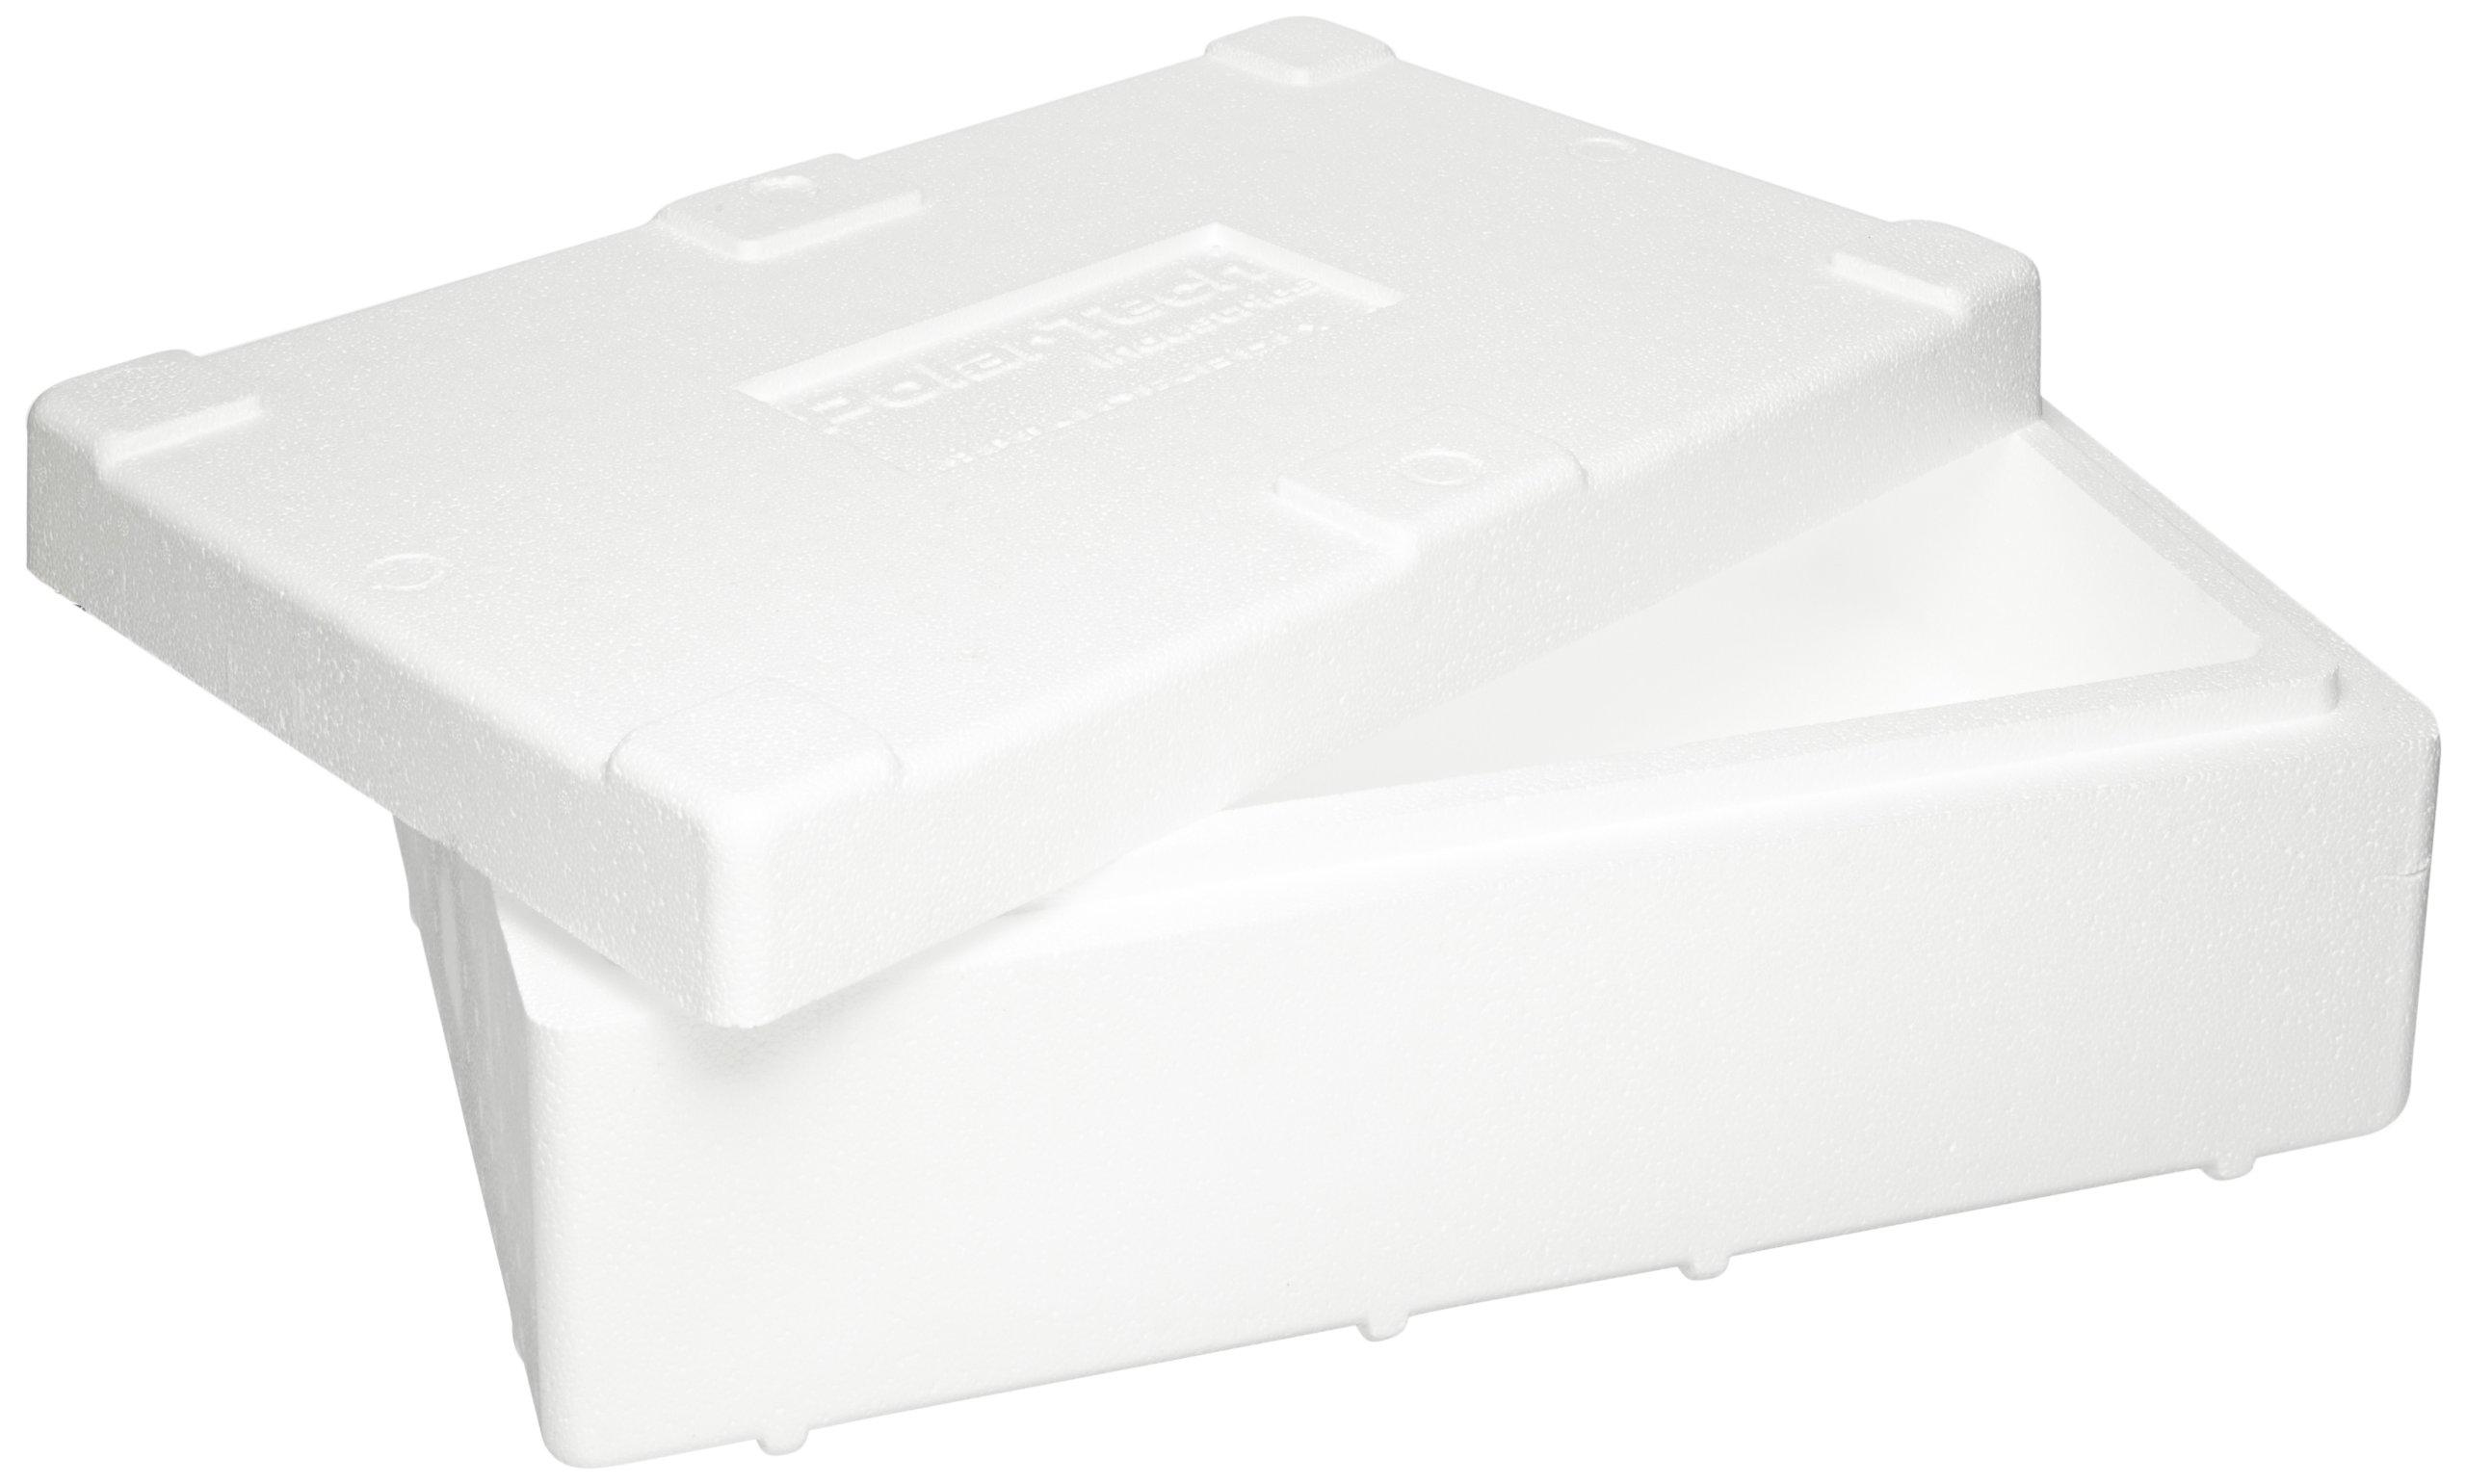 Polar Tech 245C Thermo Chill Insulated Carton with Foam Shipper, Medium, 17'' Length x 10'' Width x 8-1/4'' Depth by Polar Tech (Image #2)